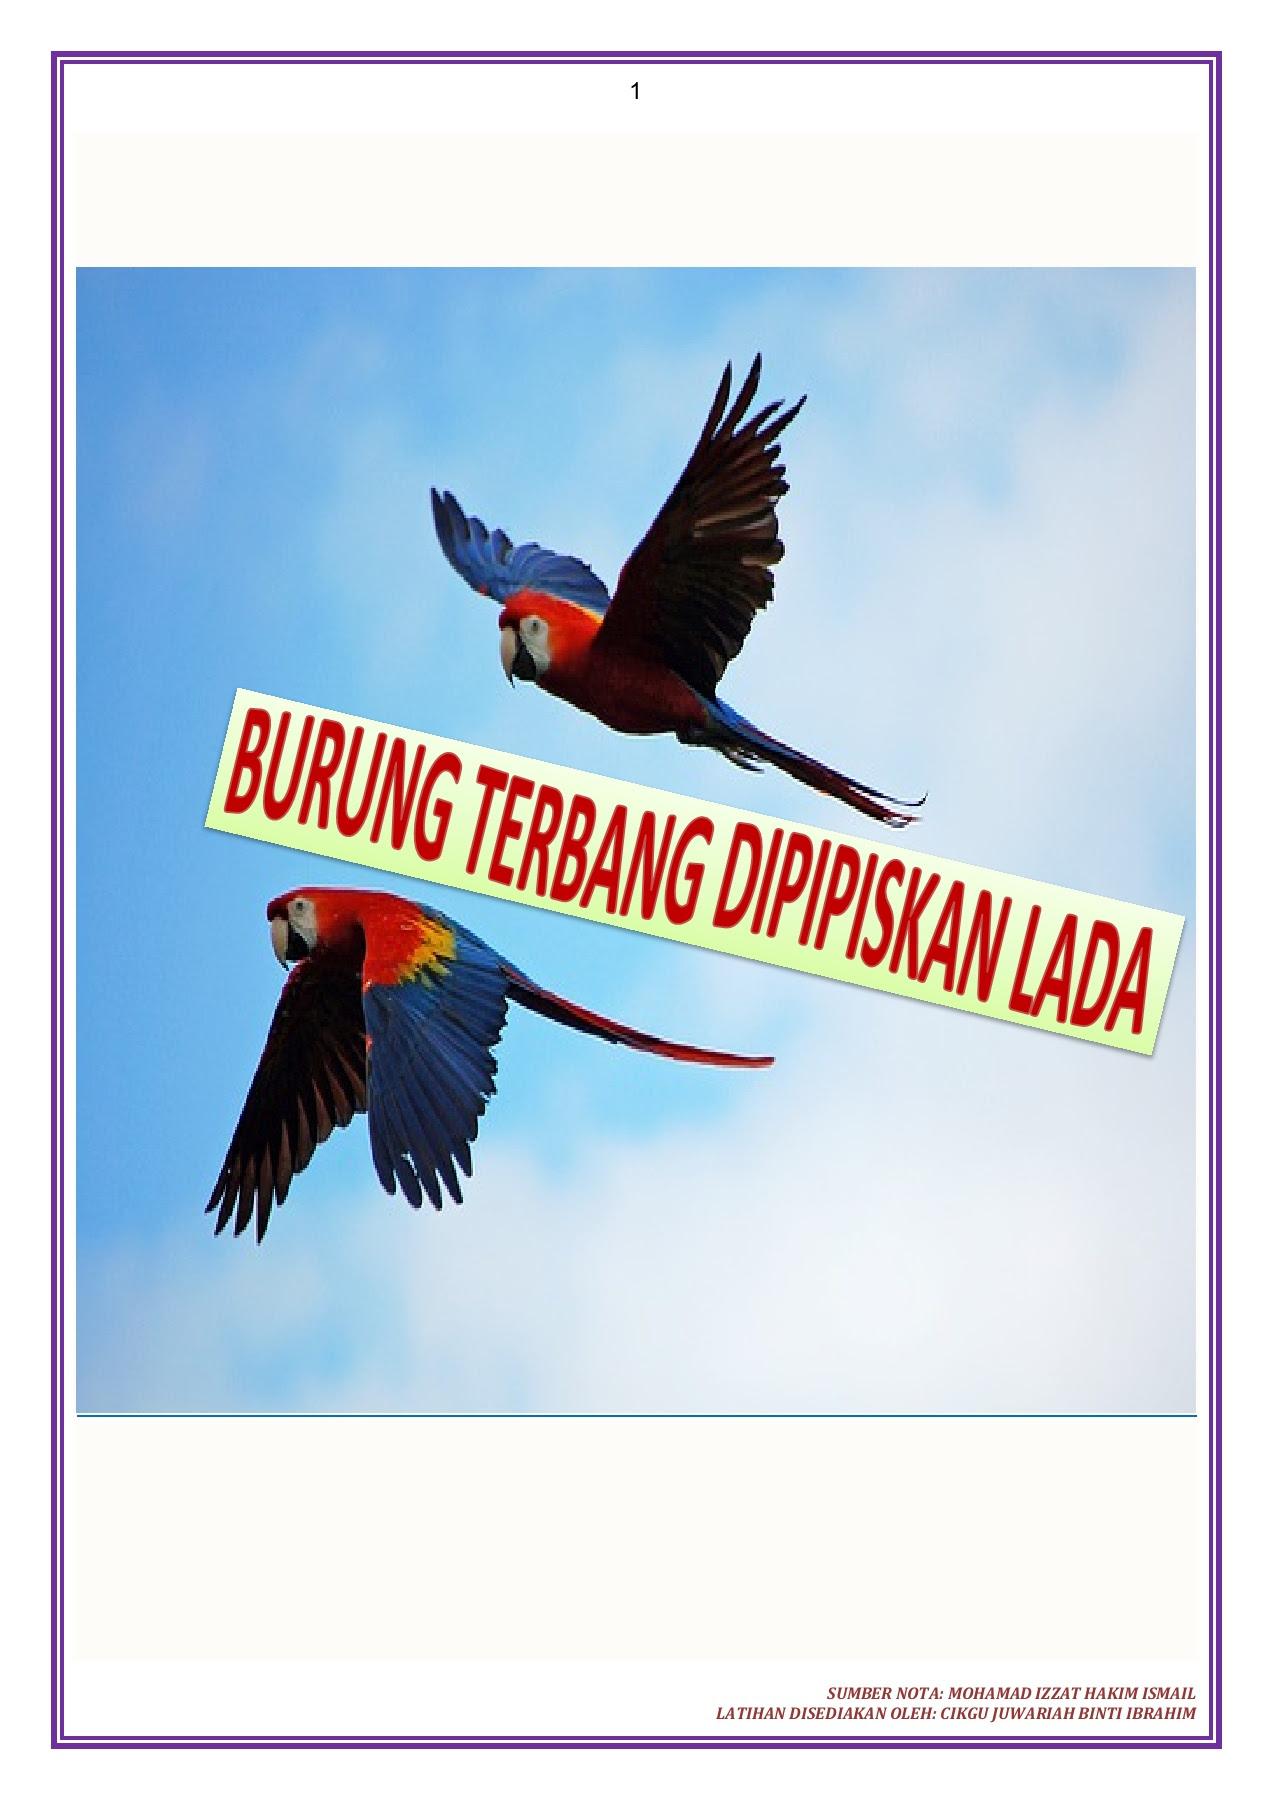 Nota Dan Latihan Prosa Tradisional Burung Terbang Dipipiskan Lada Dari Antologi Sejadah Rindu Latihan Bm Spm Pkp Tarikh 13 April 2020 Isnin Flip Ebook Pages 1 9 Anyflip Anyflip